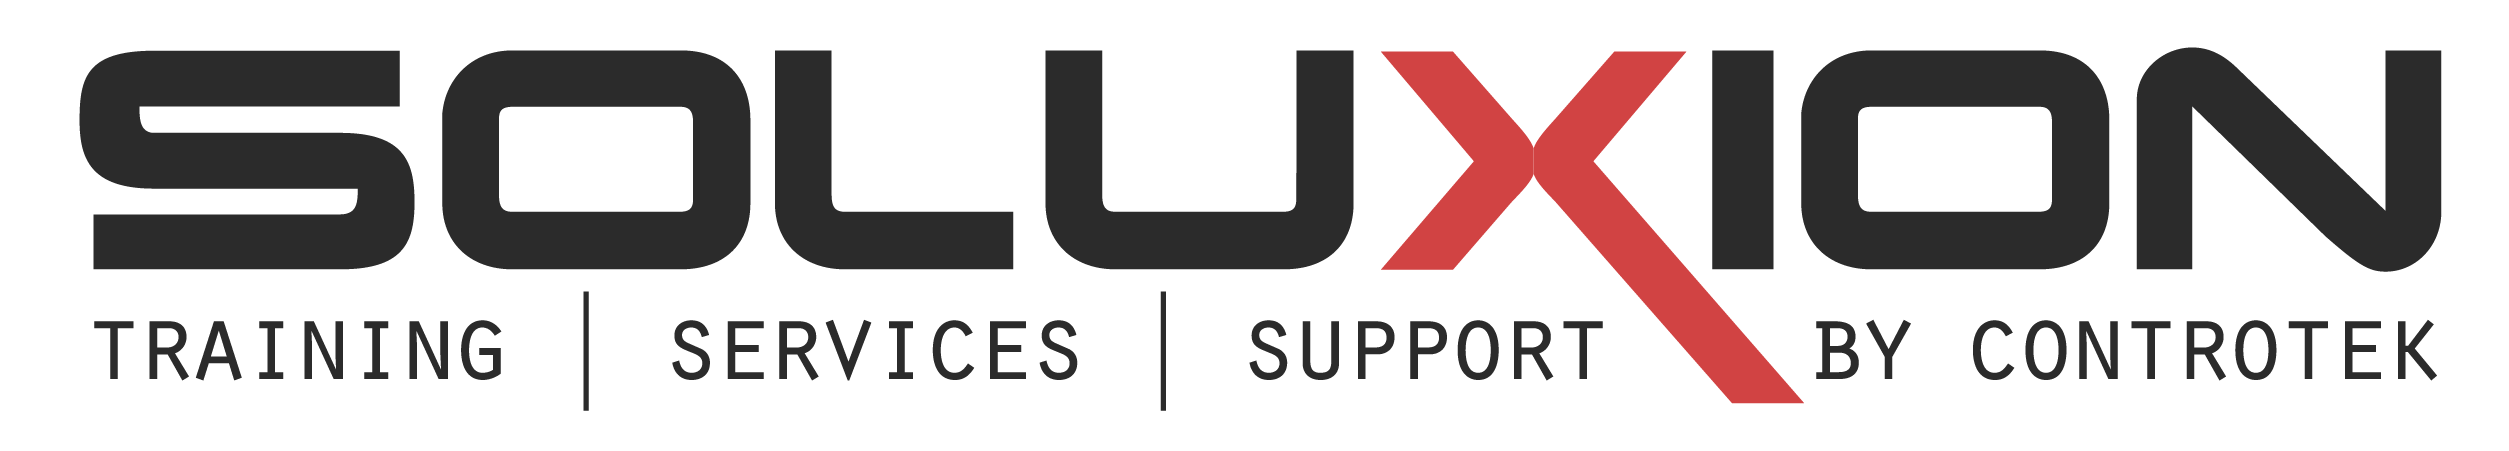 SoluXion_Controtek_Trainings